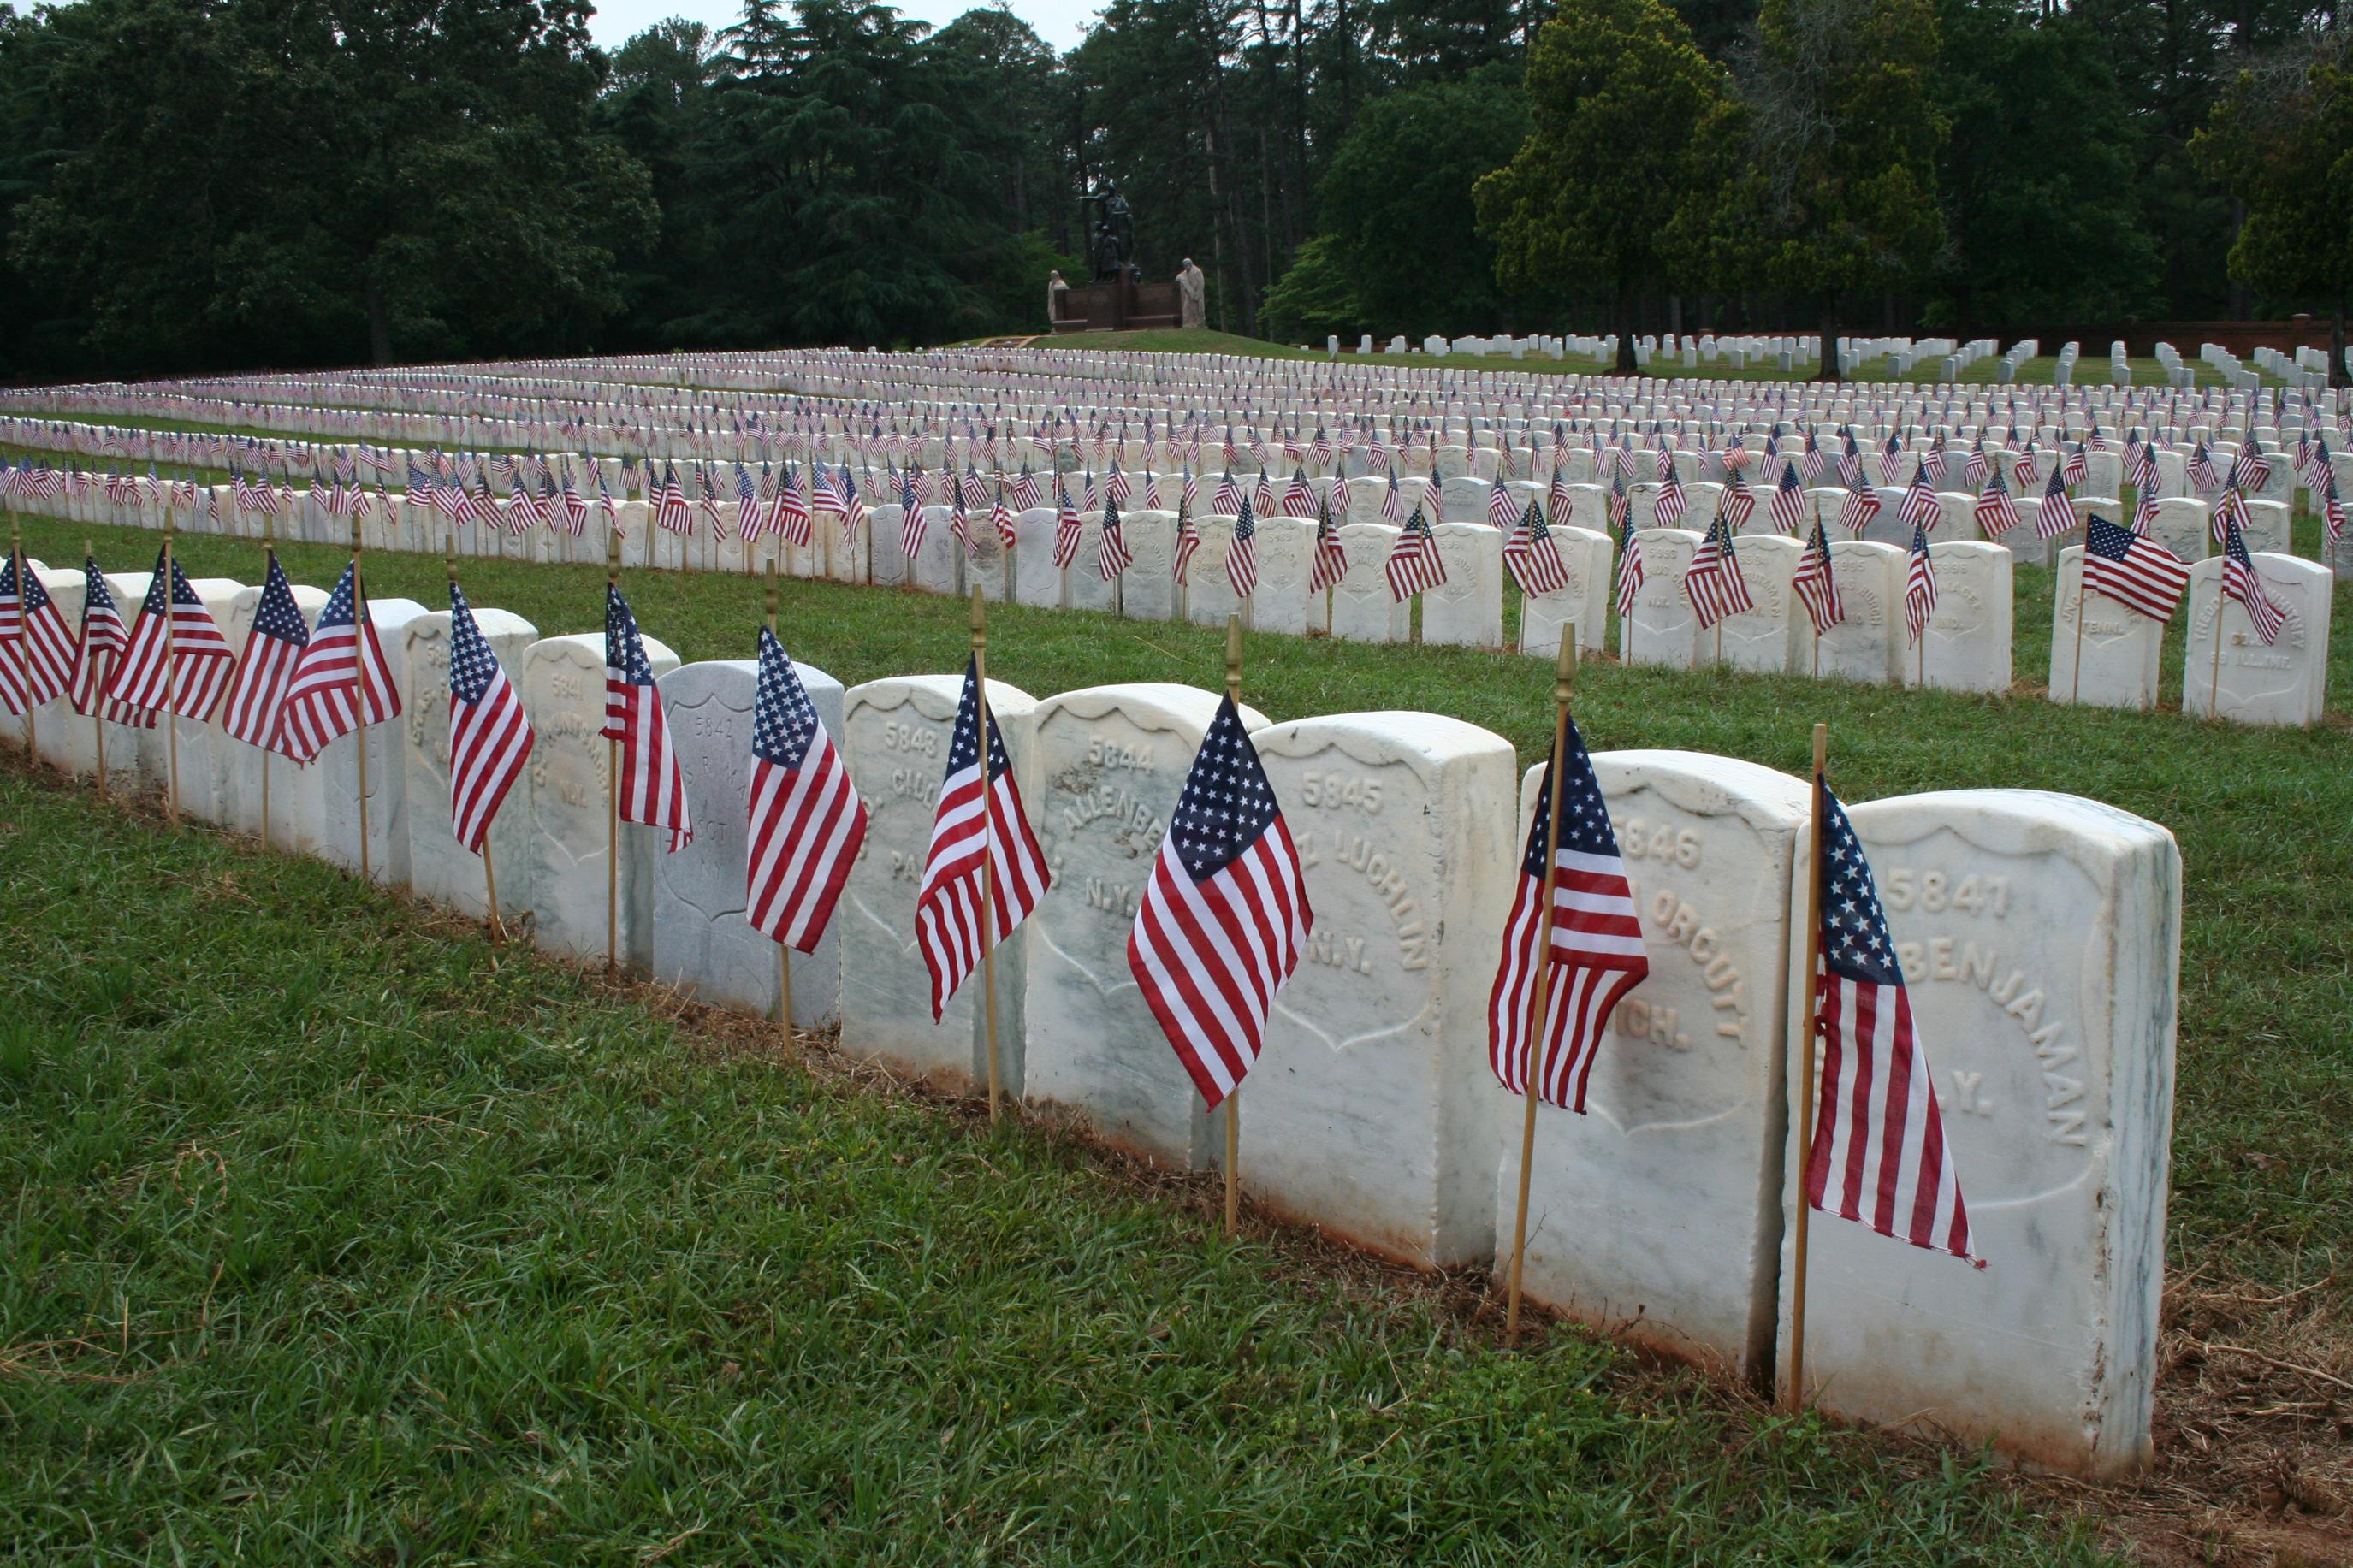 May 25th - Memorial Day